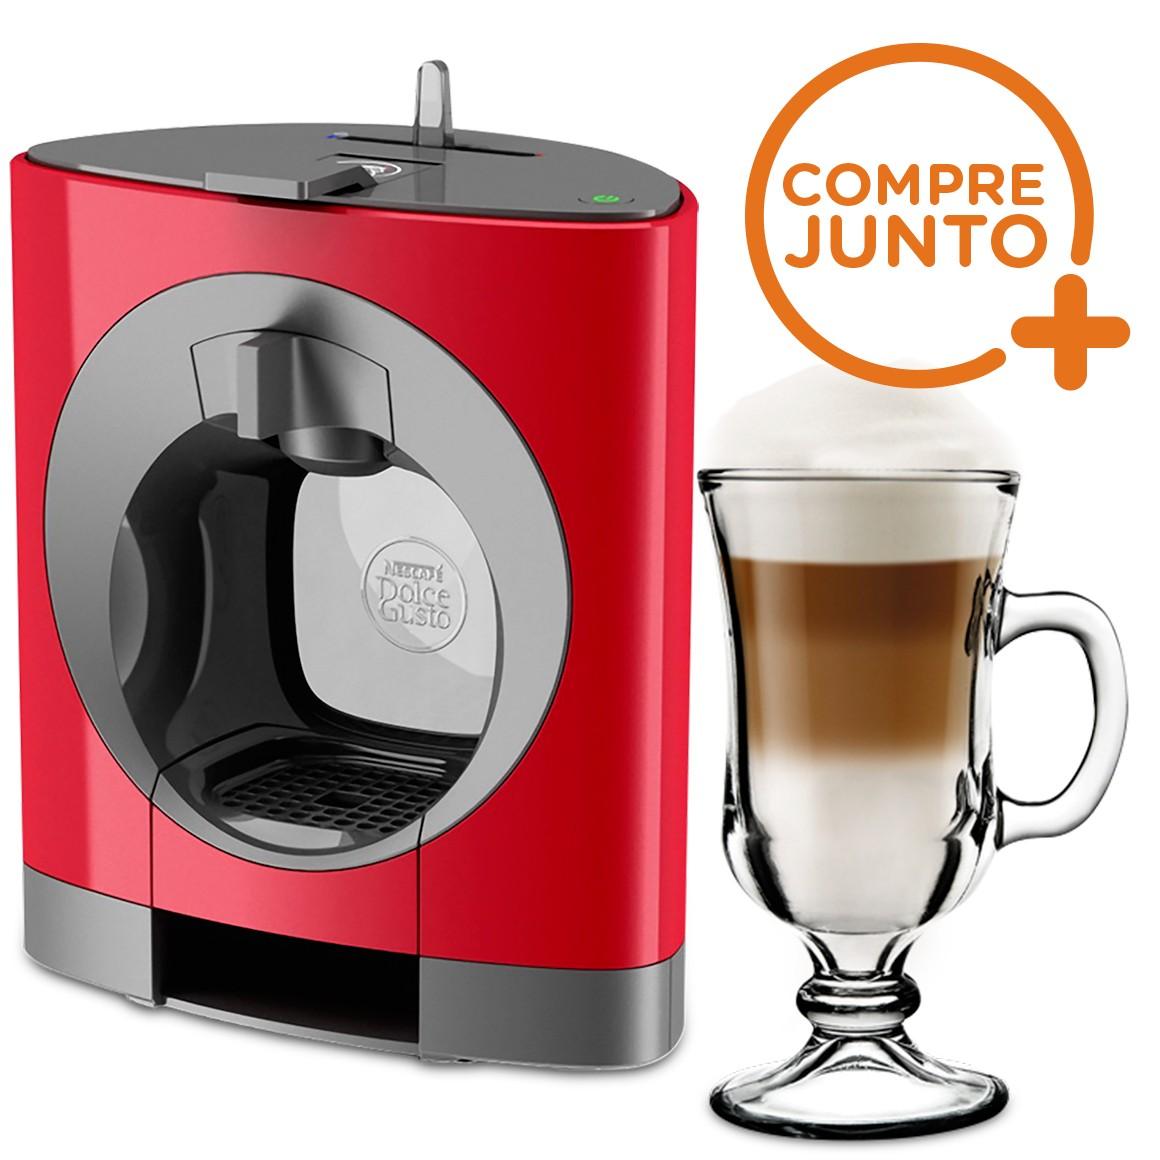 Cafeteira Expresso Dolce Gusto Oblo Vermelha 220v + 1 Taça Nevada Irish Coffee 130ml